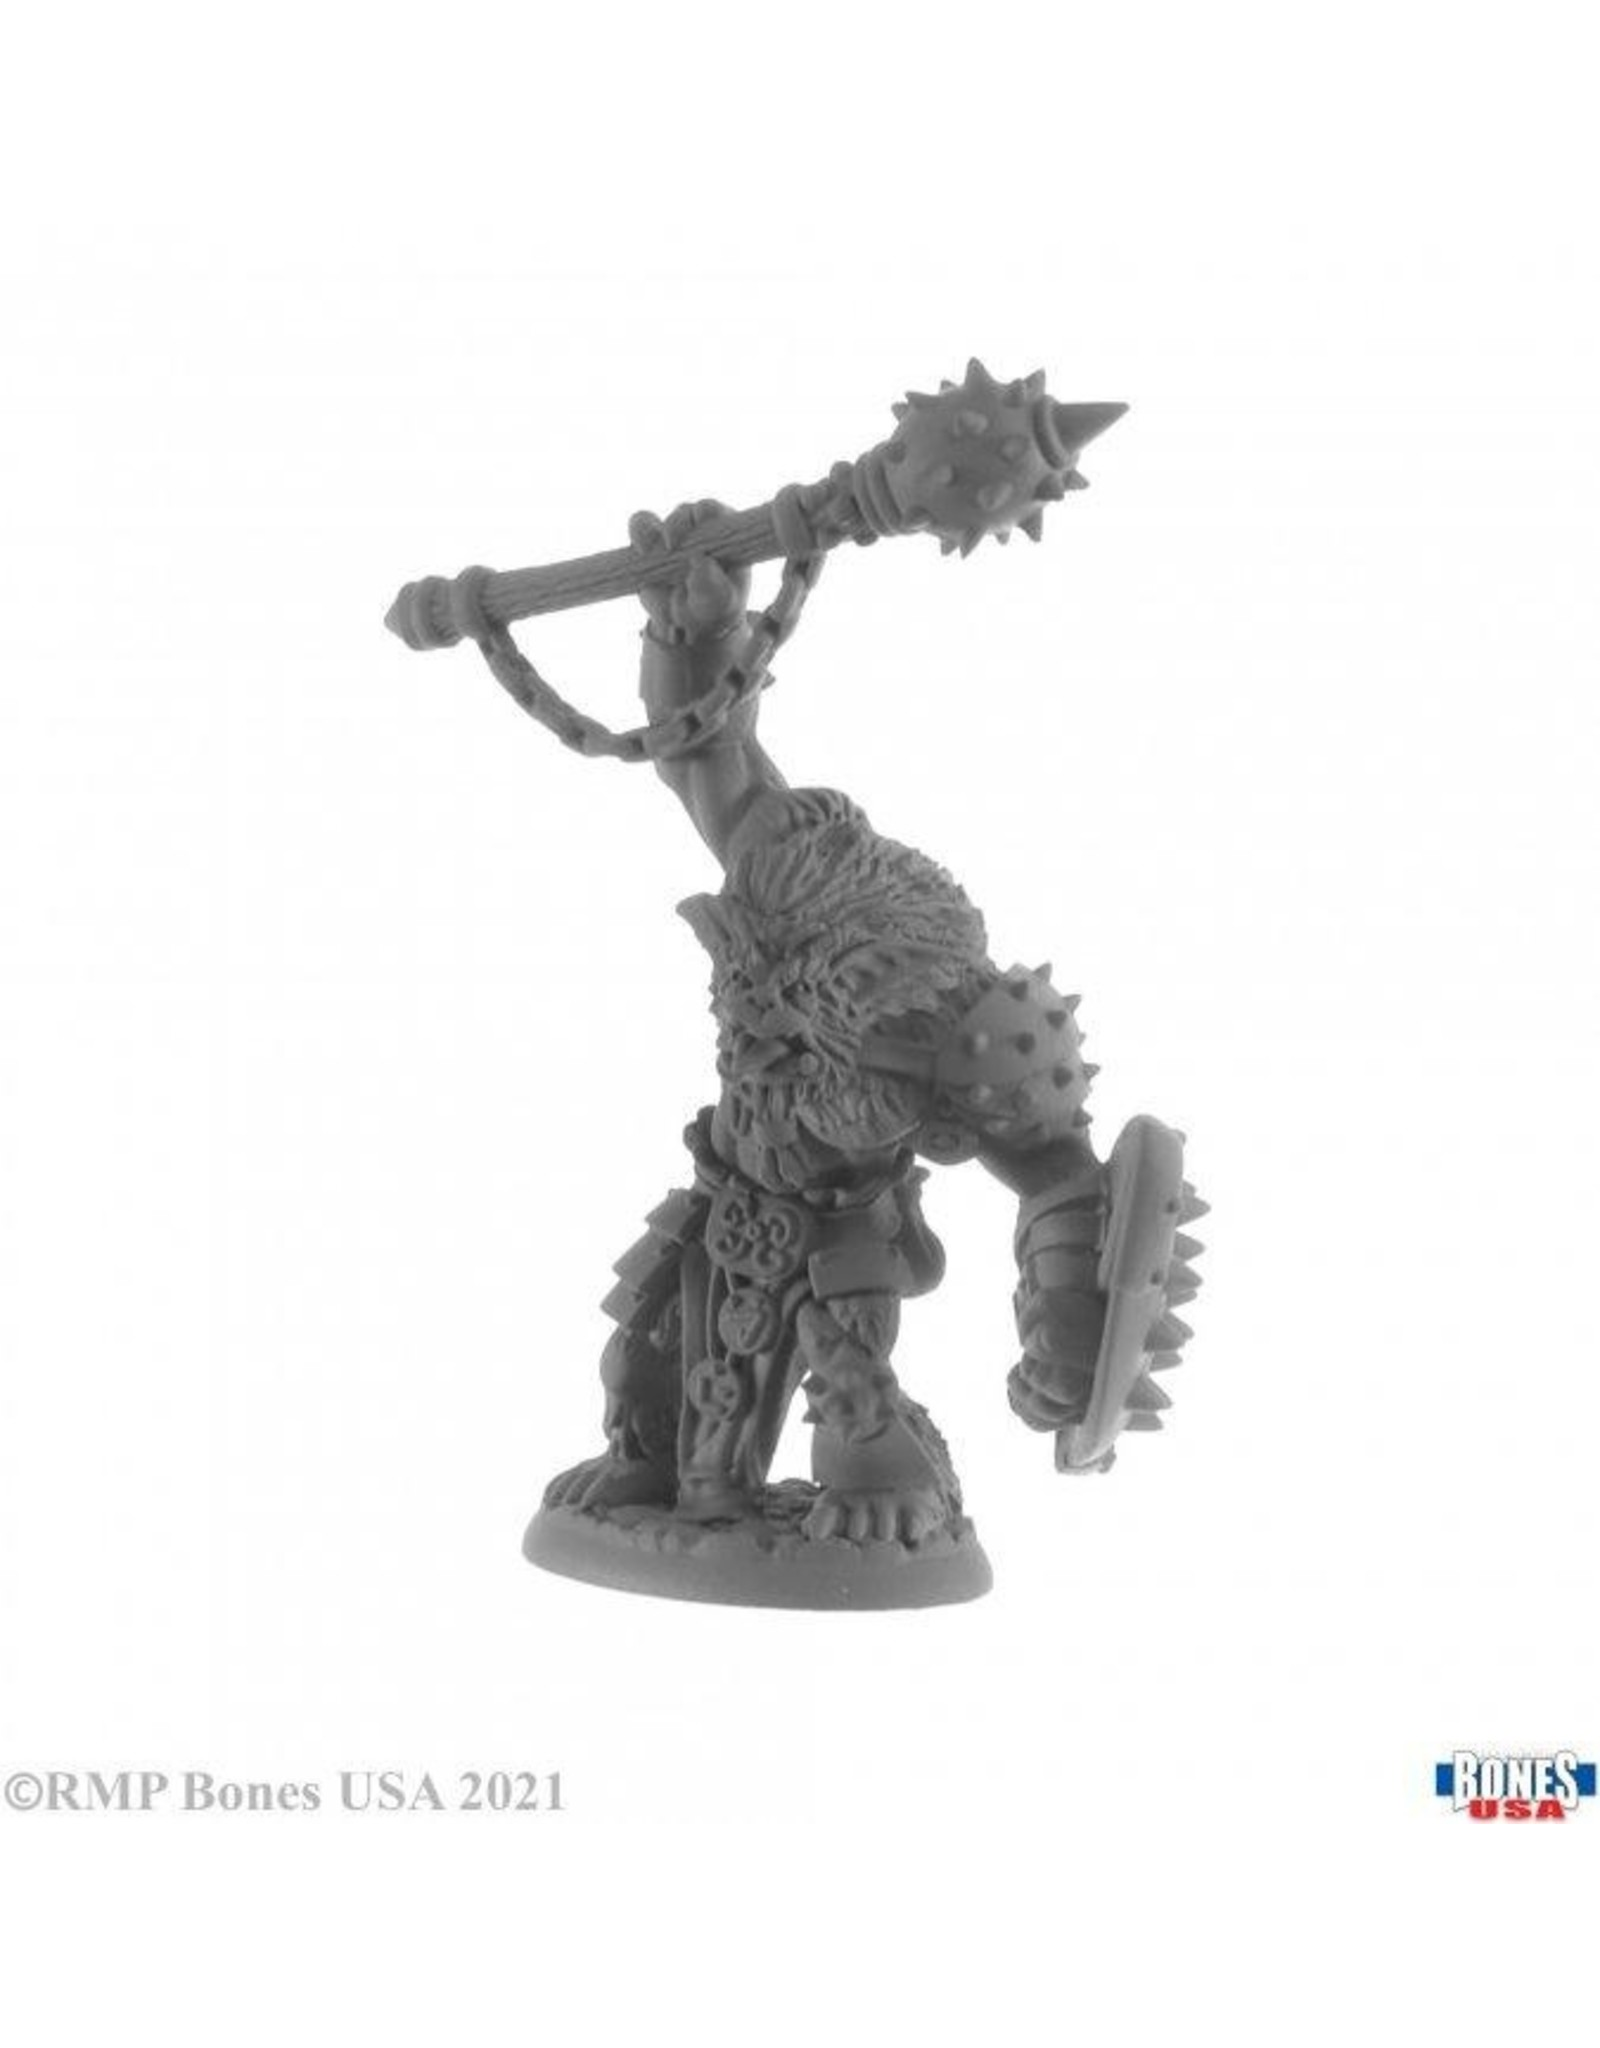 Reaper Miniatures Bhonk, Bugbear Chieftan